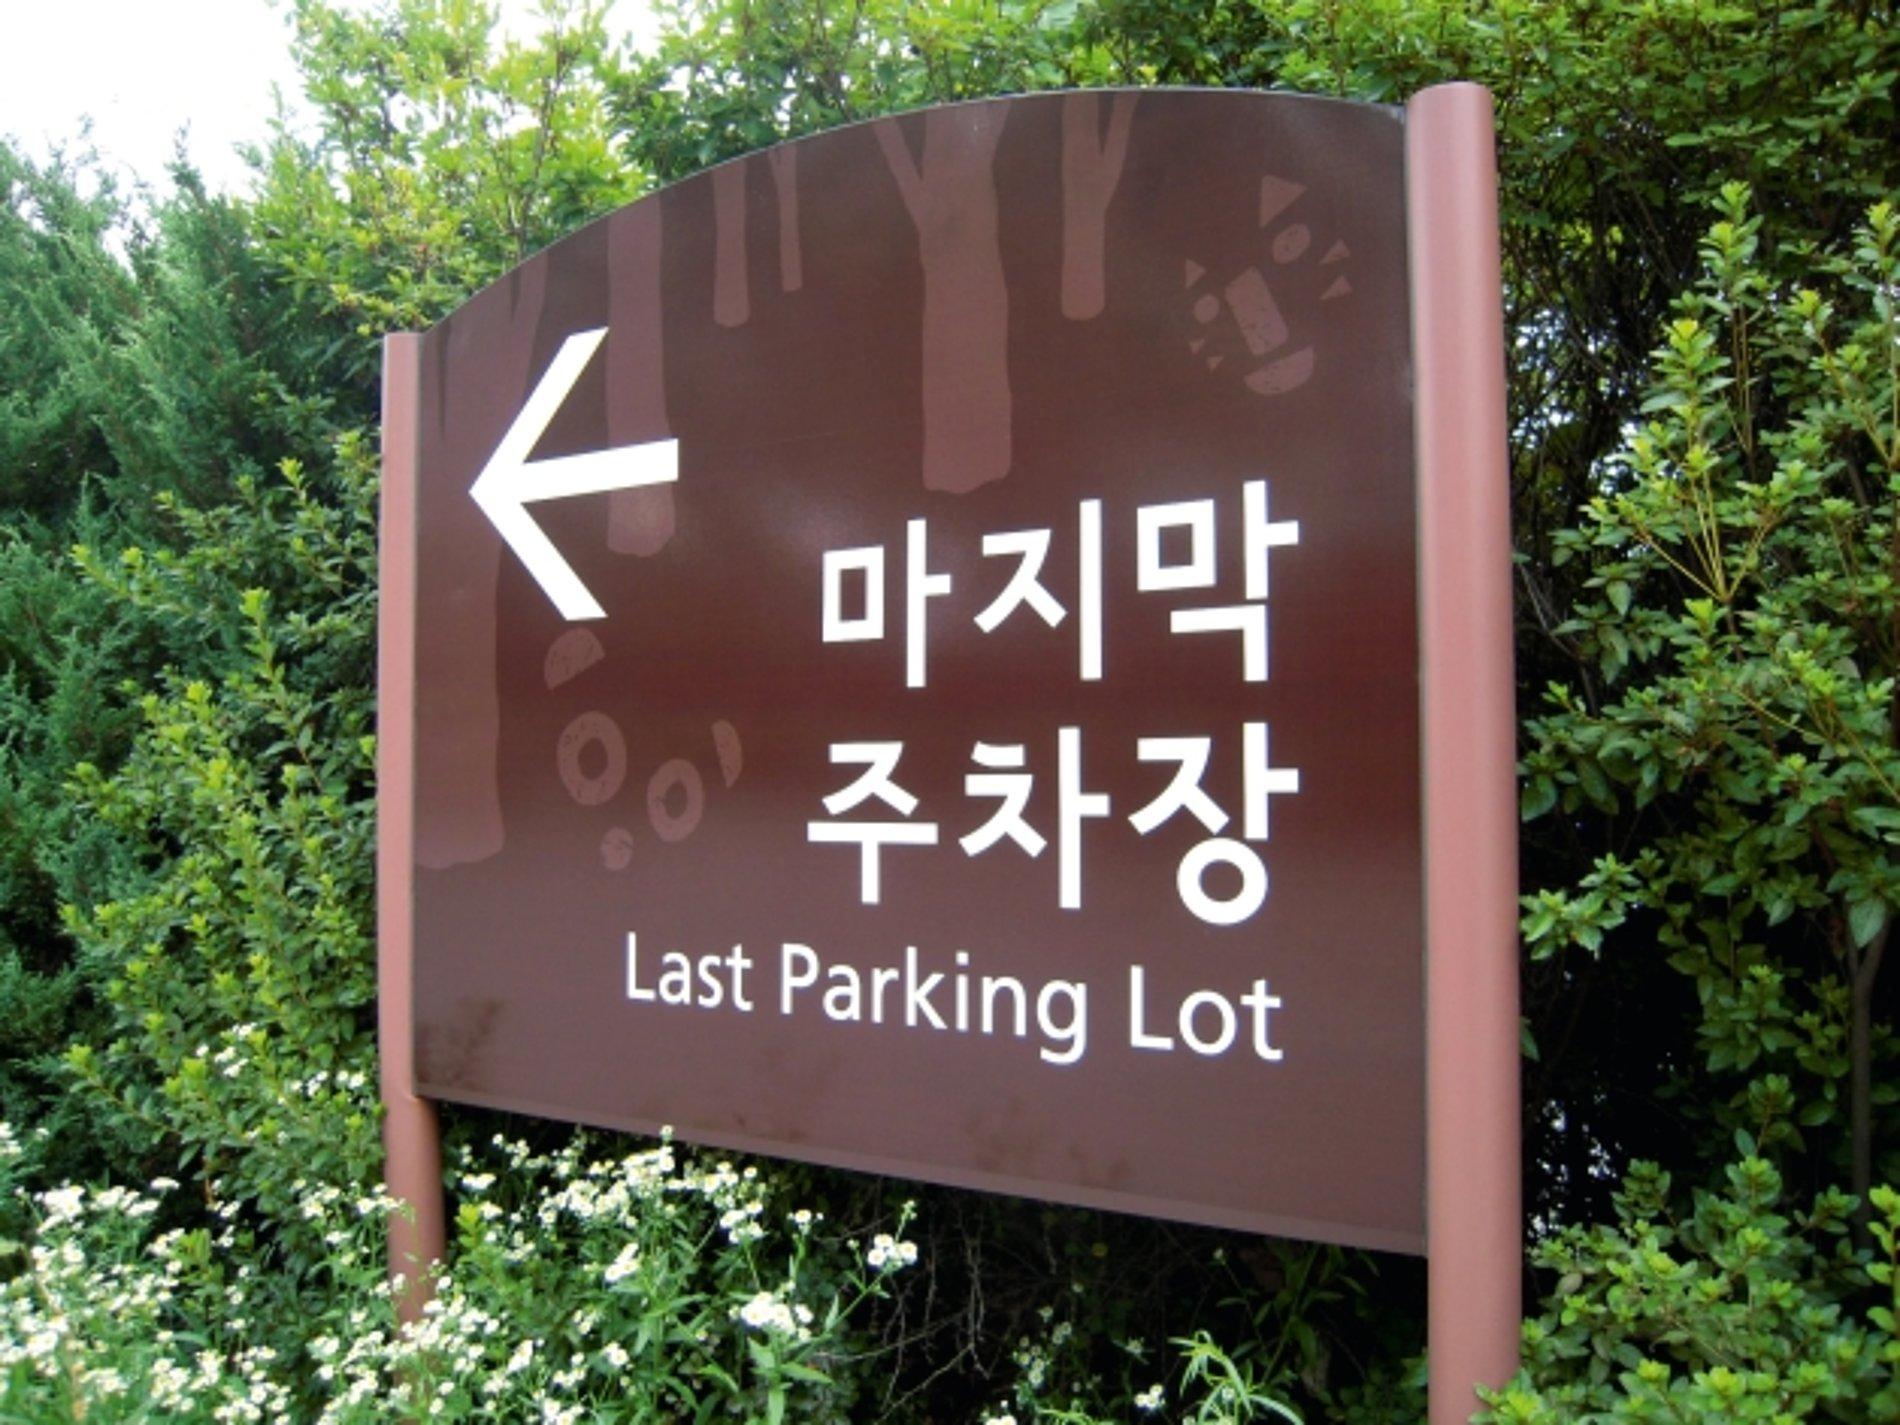 Seoul Zoo | Red Dot Design Award